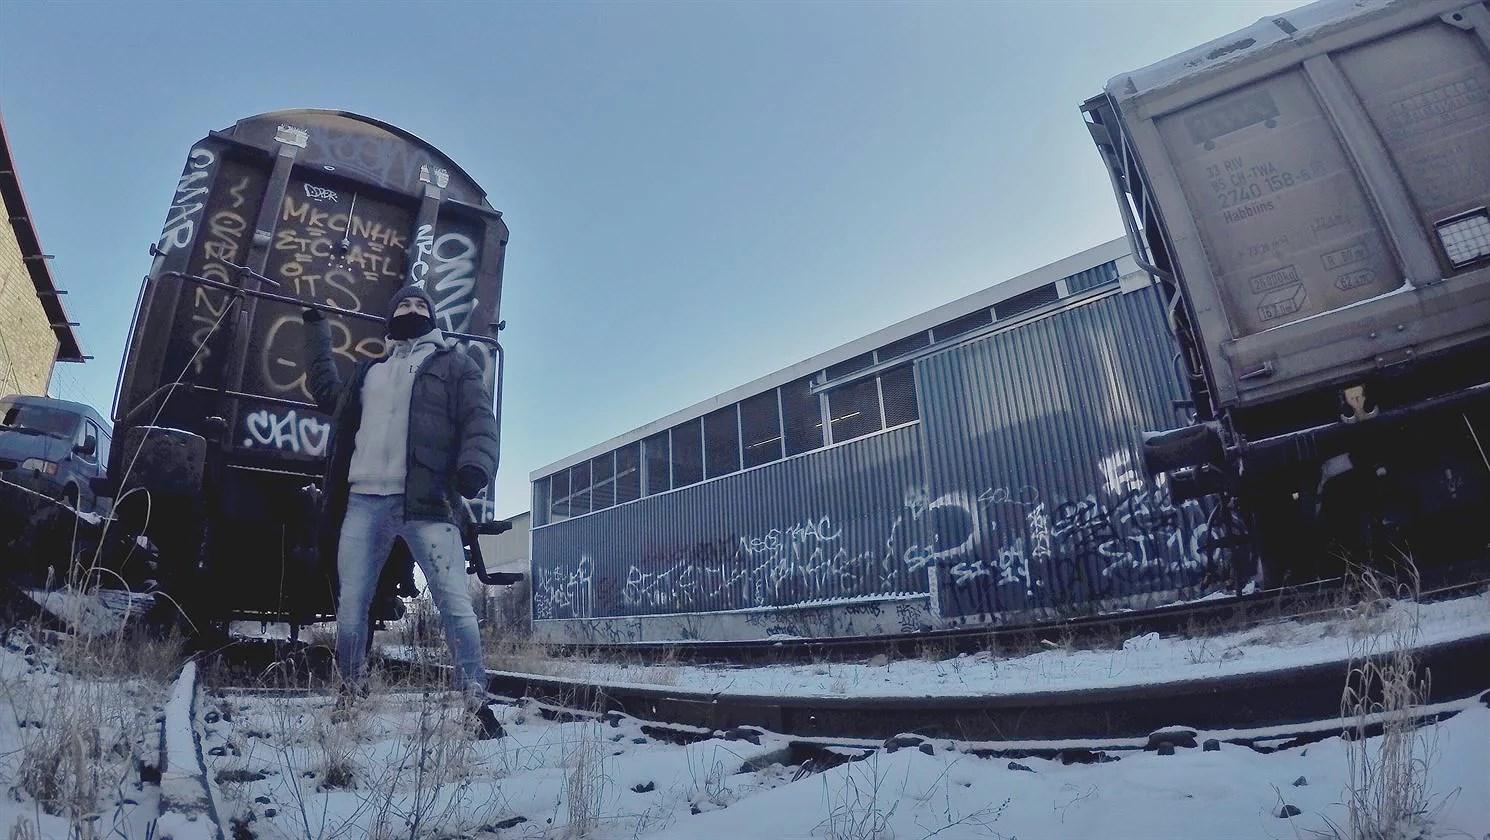 Daniel Ekstam, Zeeksack, Bloggare, Otto Blücker, Musik, Skivomslag, Ny Singel